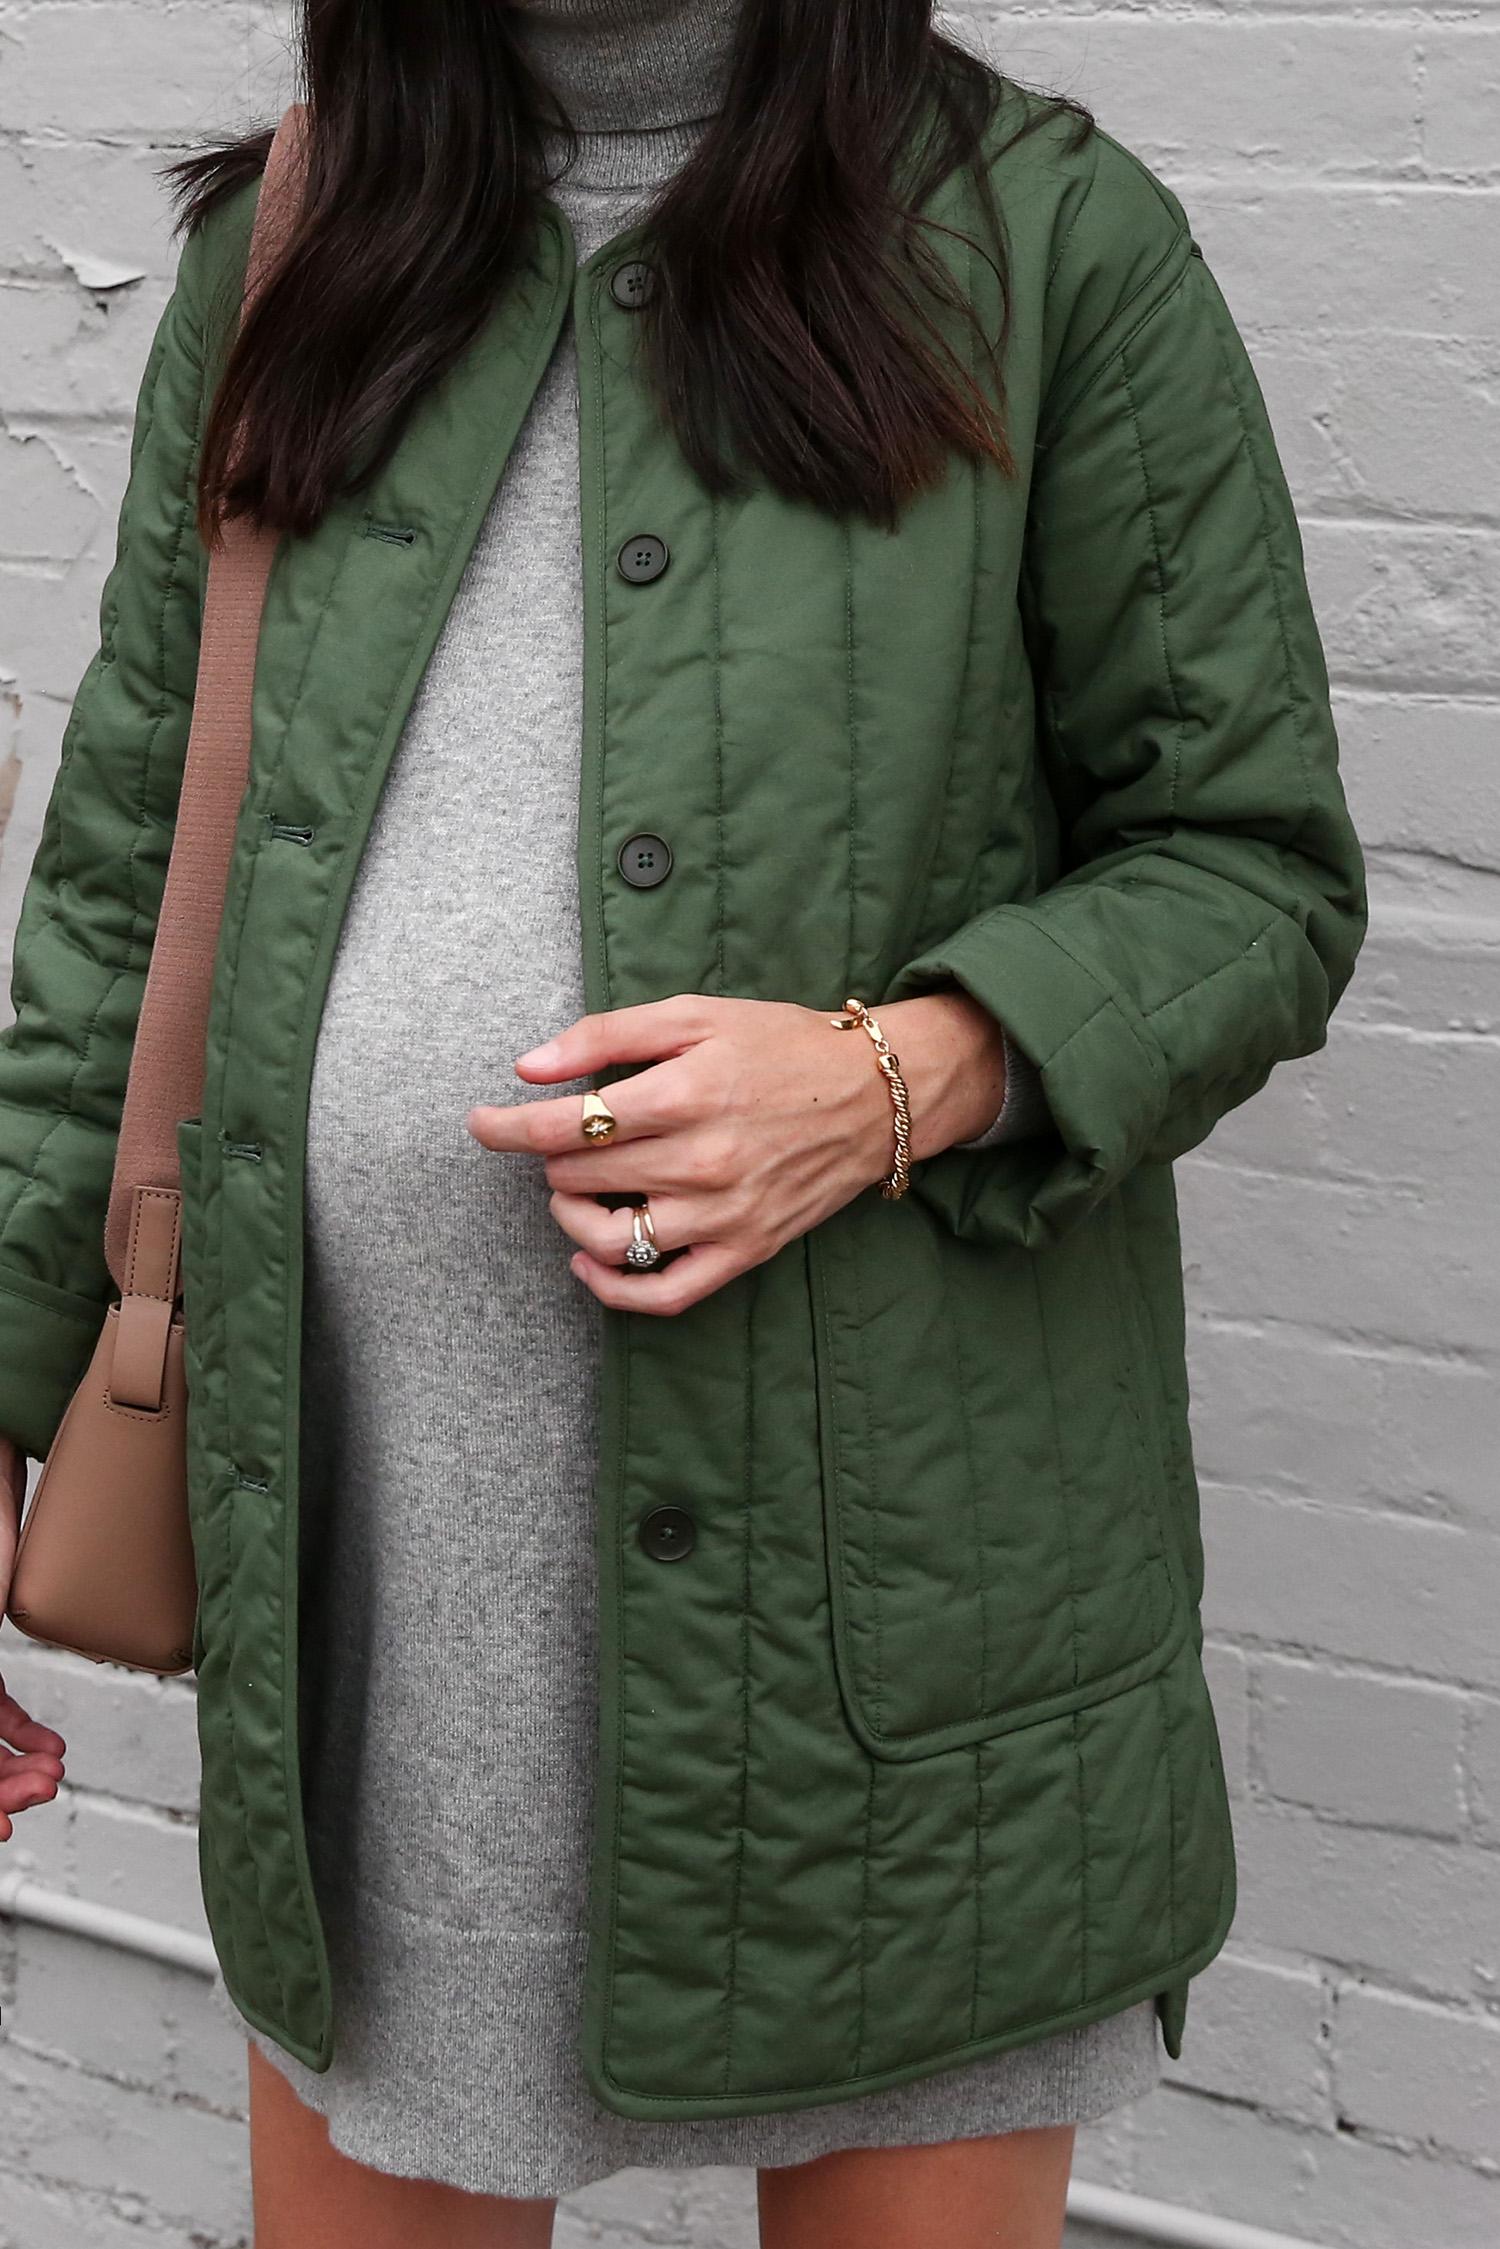 Autumn Wardrobe Planning With Everlane Mademoiselle A Minimalist Fashion Blog